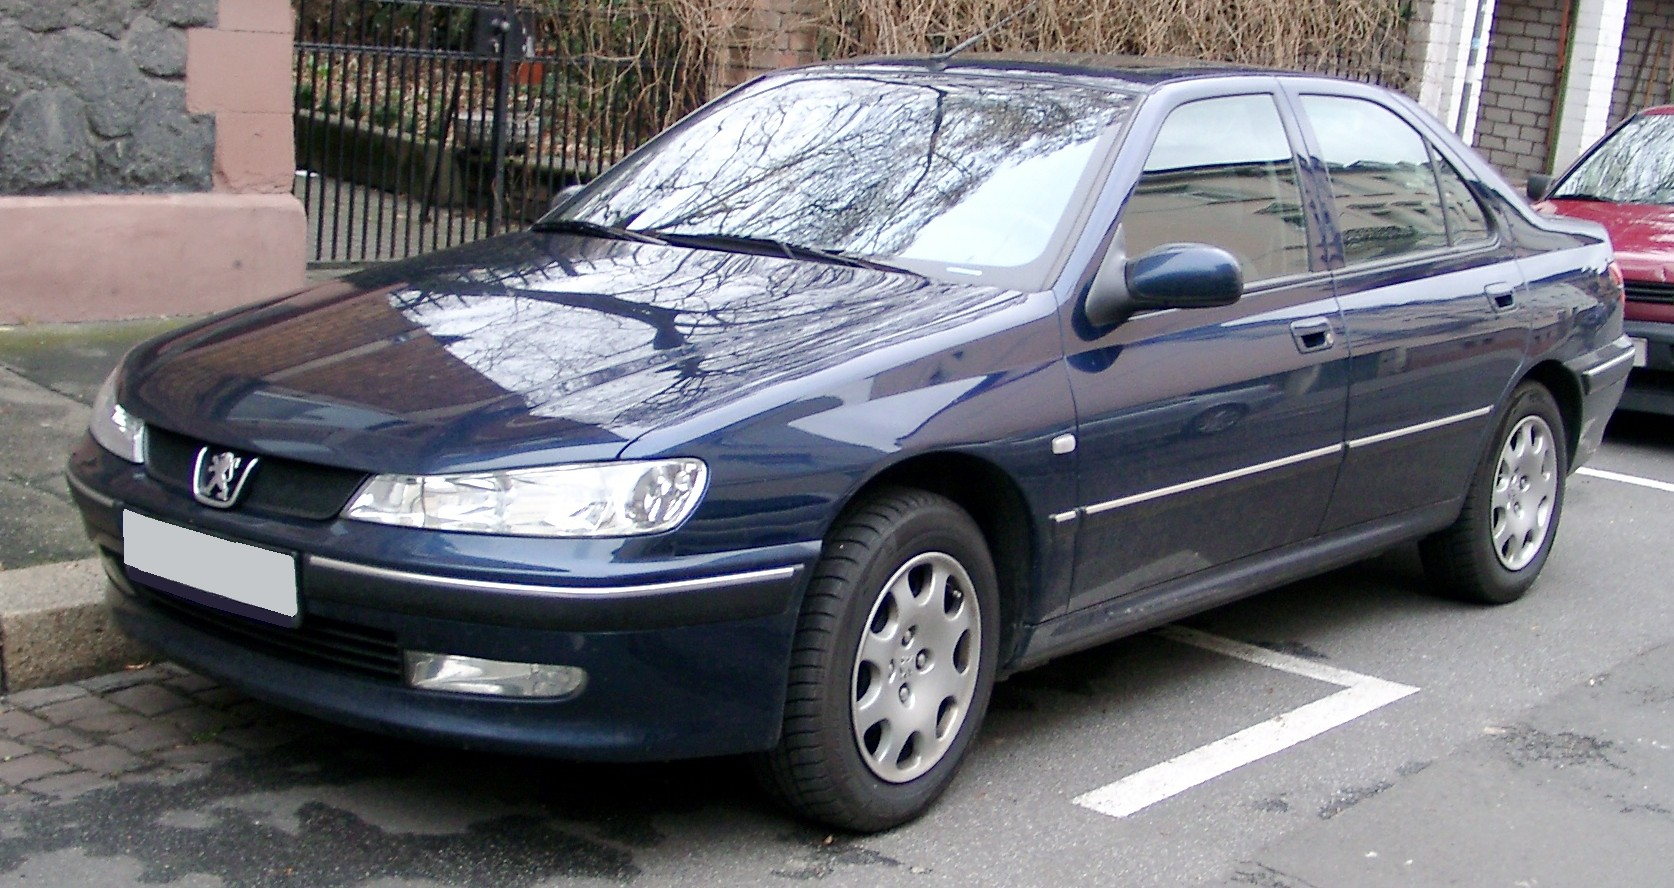 File:Peugeot 406 front 20080118.jpg - Wikimedia Commons